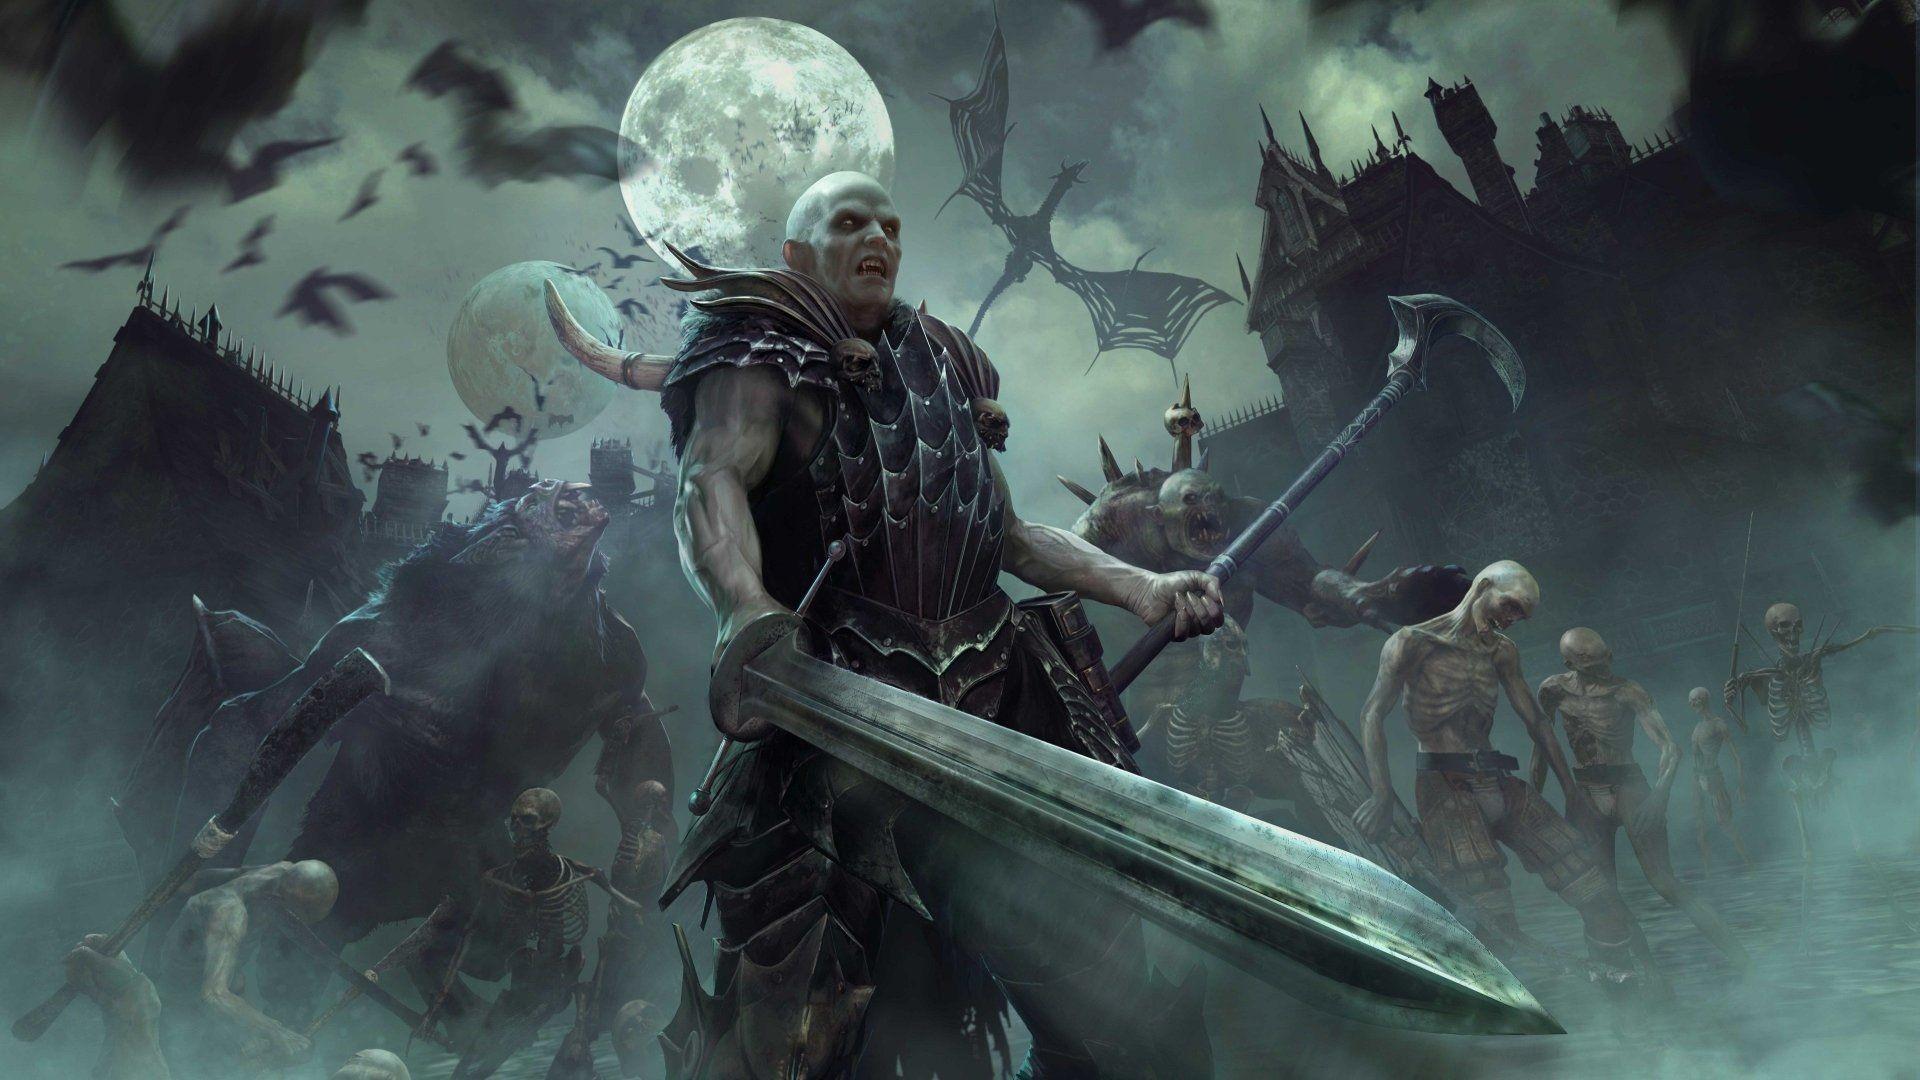 Res: 1920x1080, Video Game Total War: Warhammer Total War Undead Wallpaper